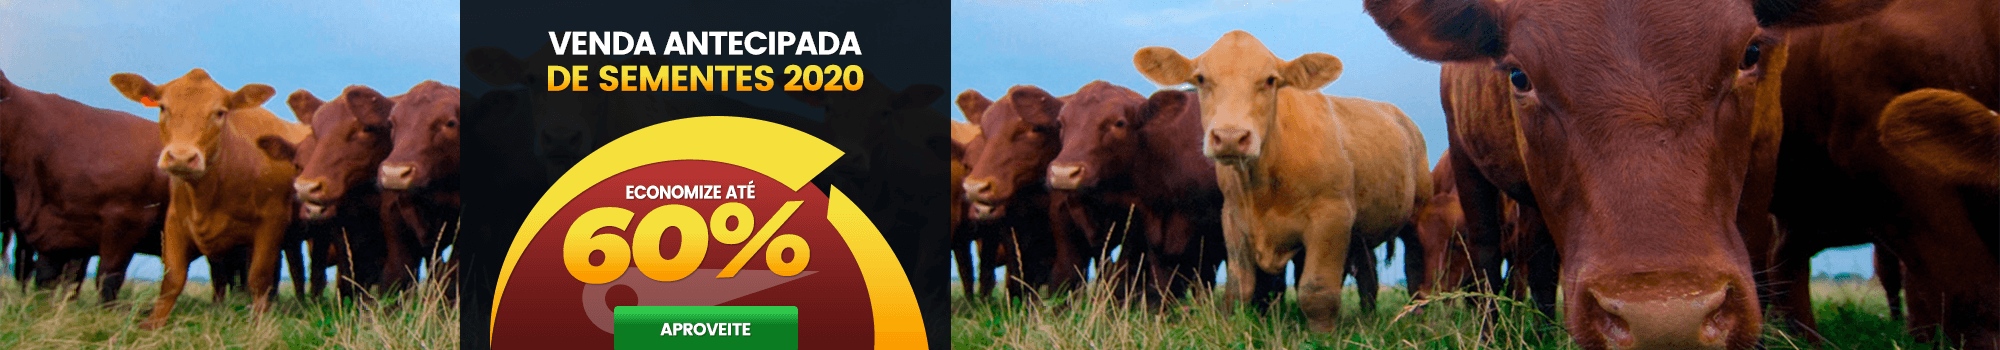 Venda antecipada de sementes 2020